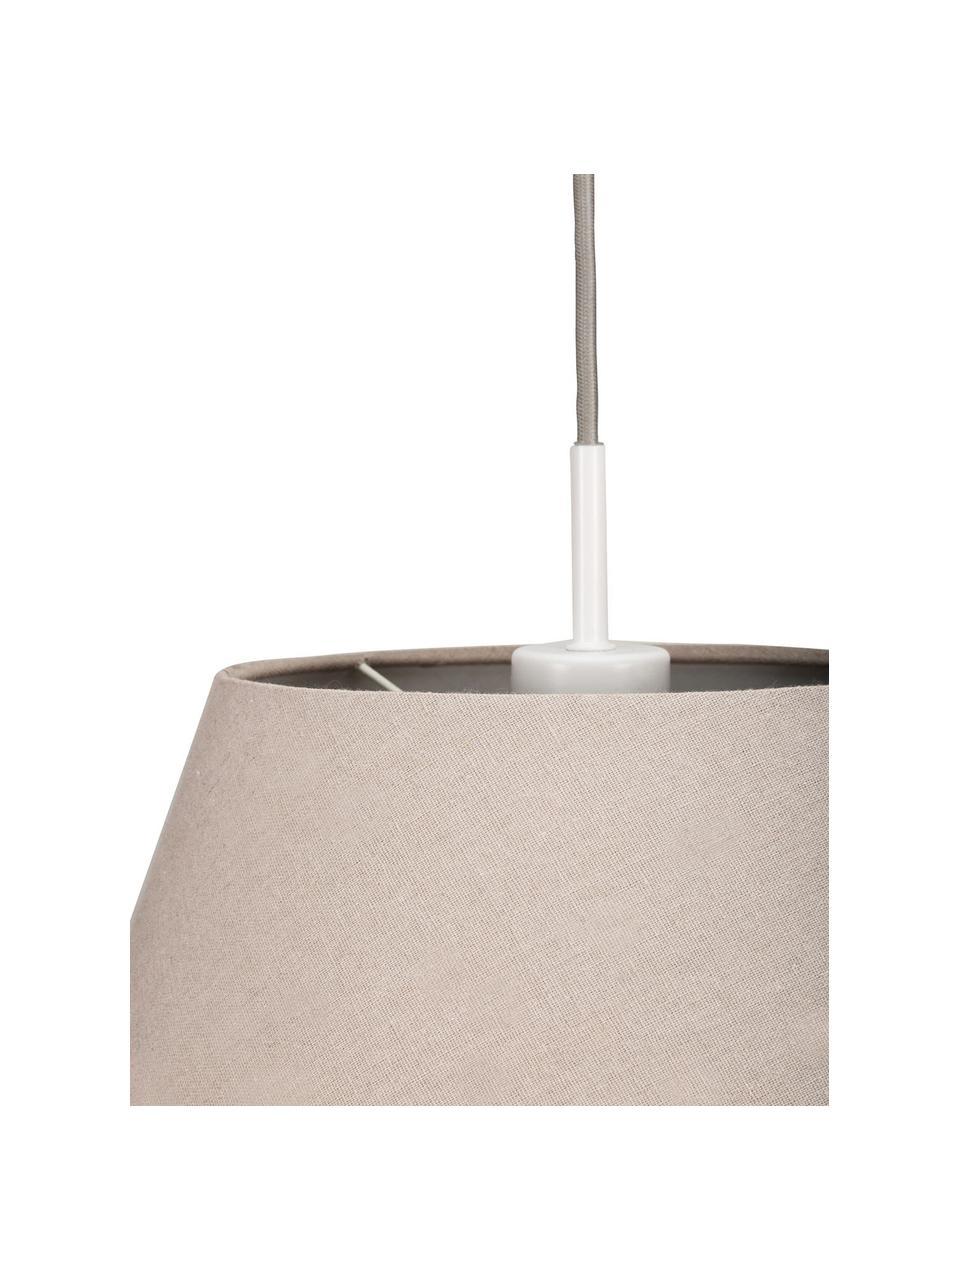 Pendelleuchte Noble Delight, Lampenschirm: Stoff, Baldachin: Metall, beschichtet, Grau, Weiß, Ø 37 x H 31 cm